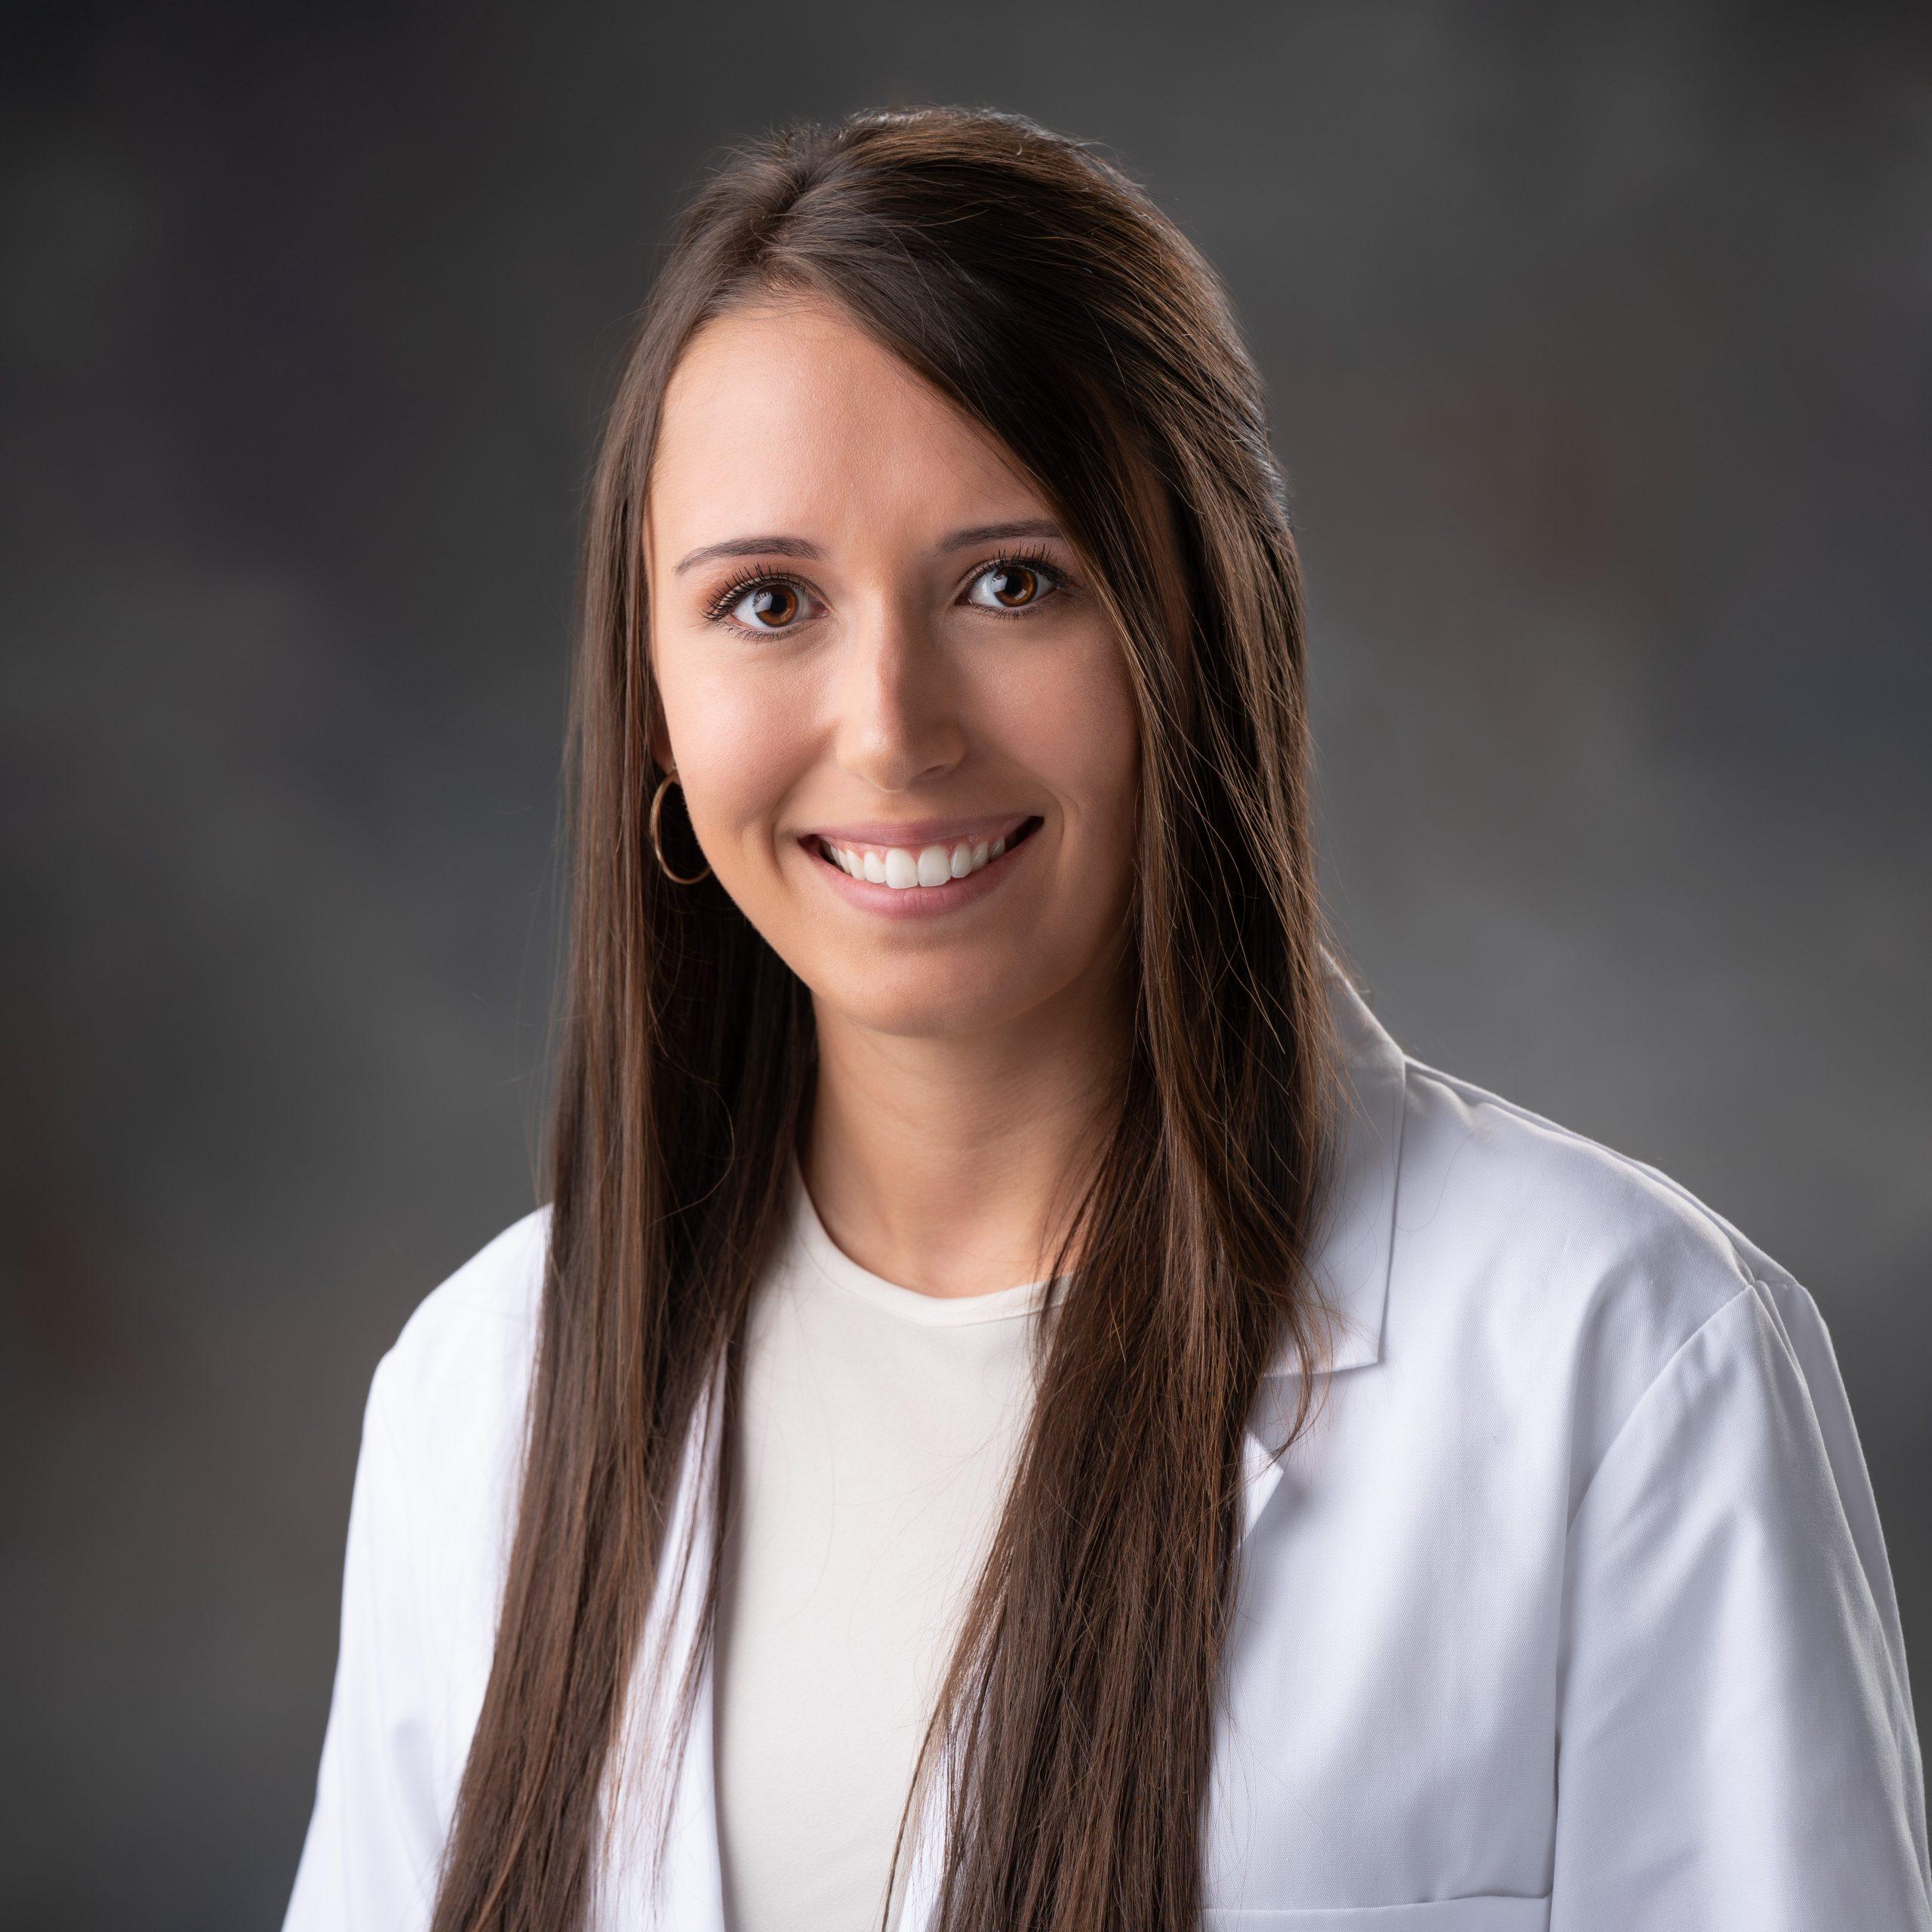 Dr. Weakland - Shopko Optical optometrist